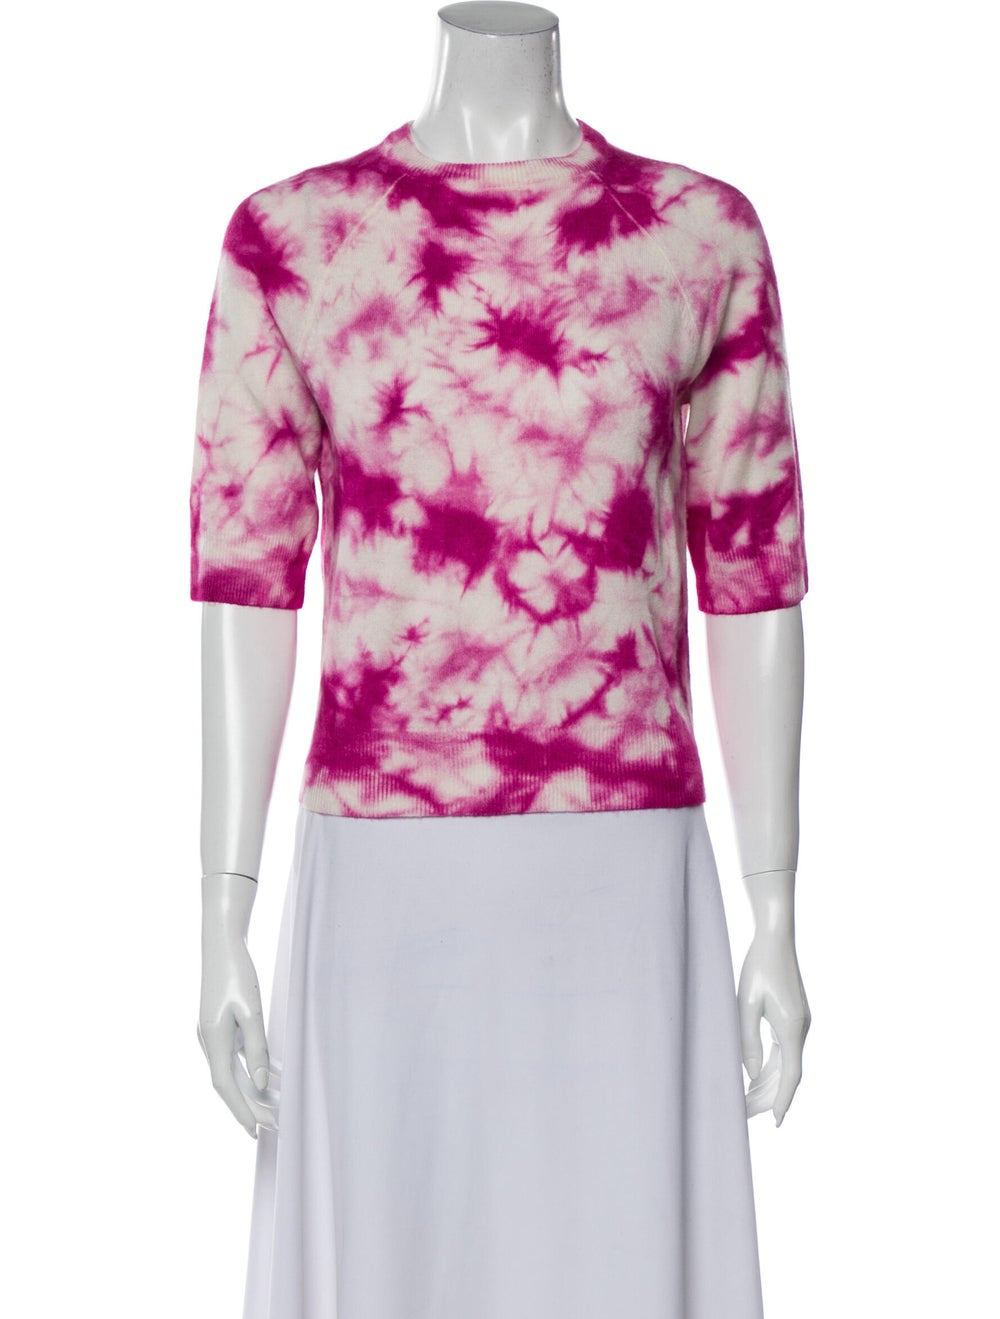 Michael Kors Cashmere Tie-Dye Print Sweater Pink - image 1